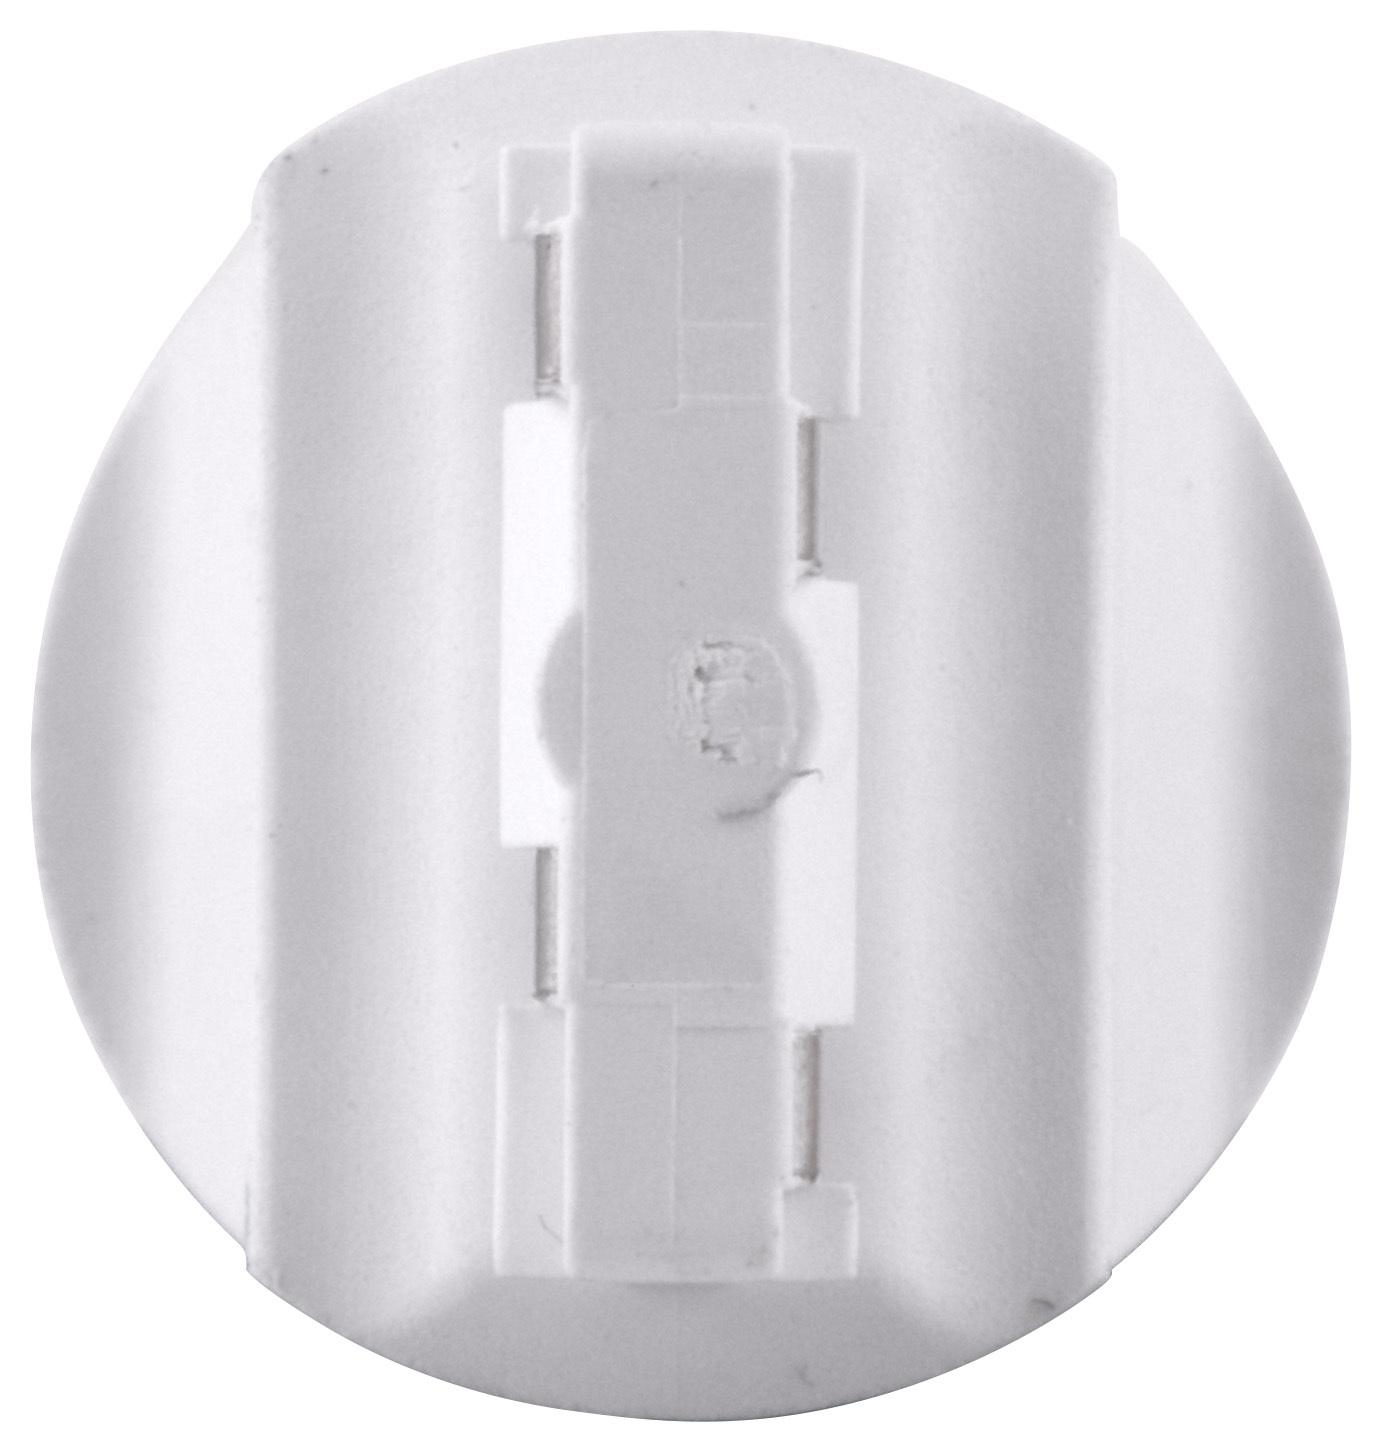 tail light bulb vision led rear outer philips 7443led ebay. Black Bedroom Furniture Sets. Home Design Ideas